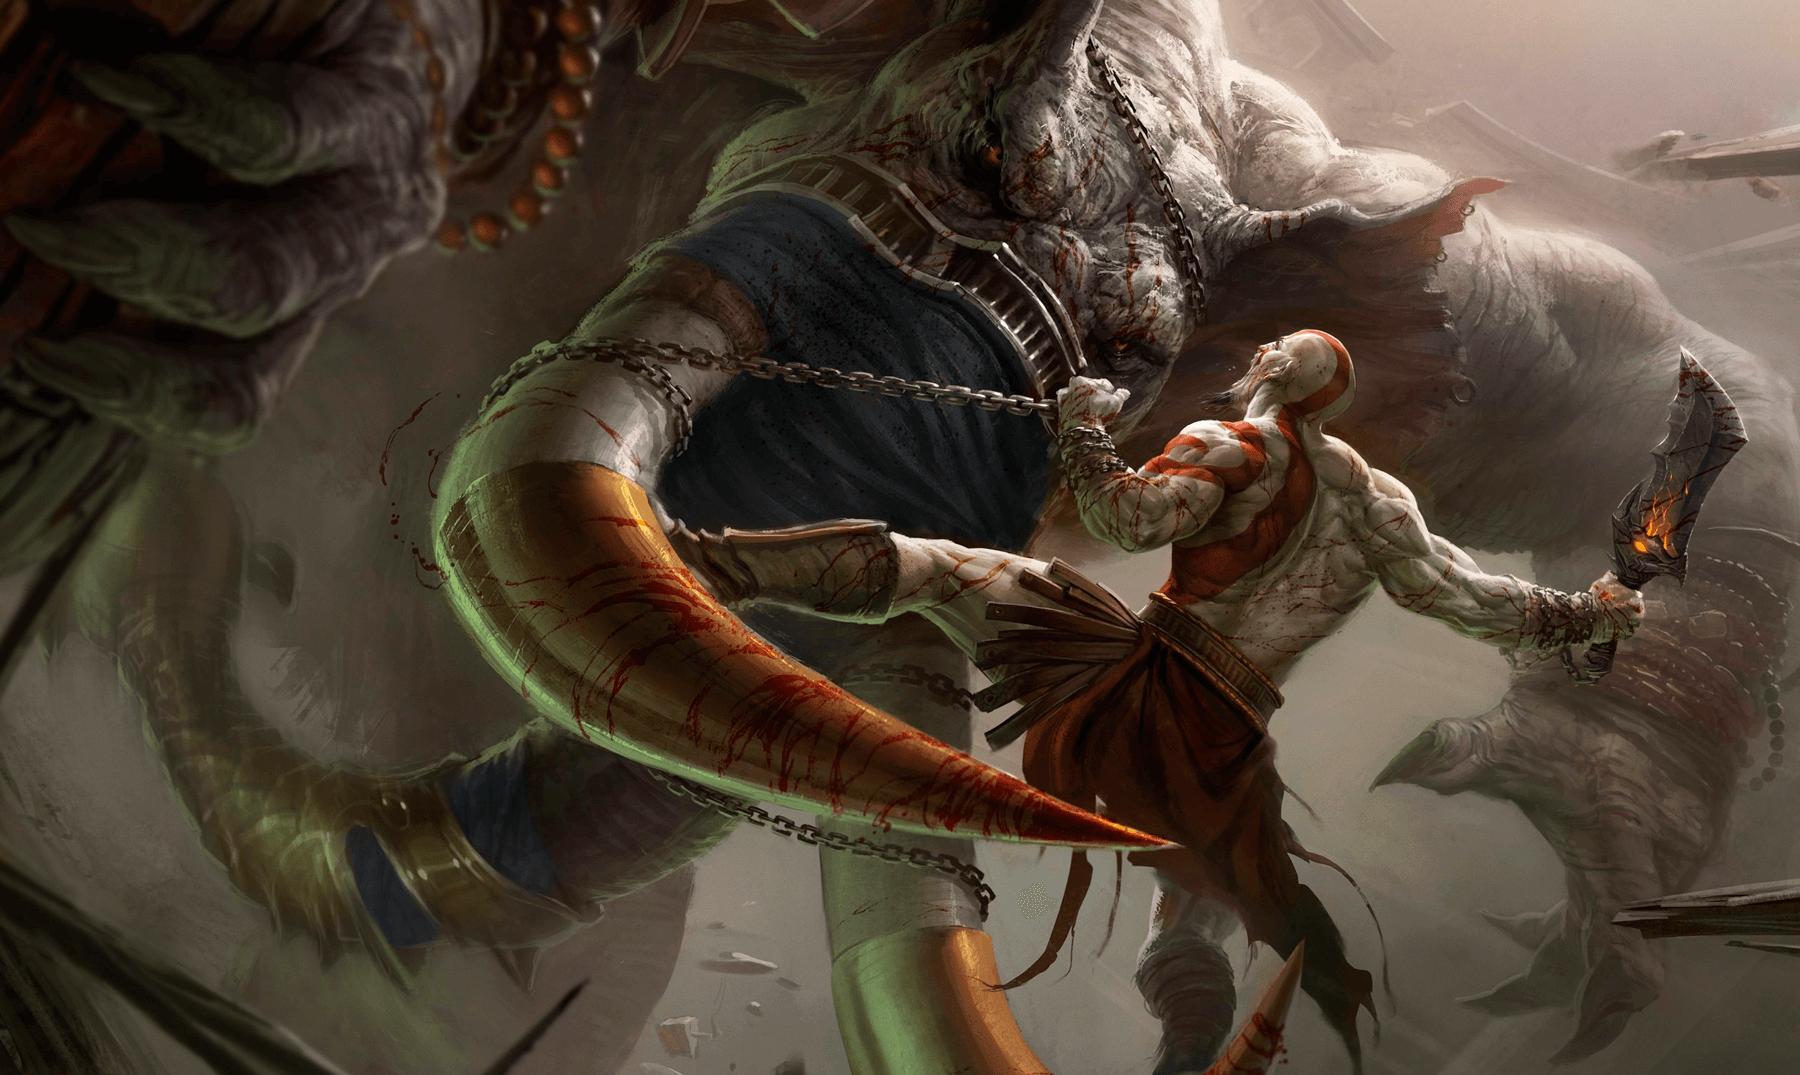 Kratos, un Dios desconocido